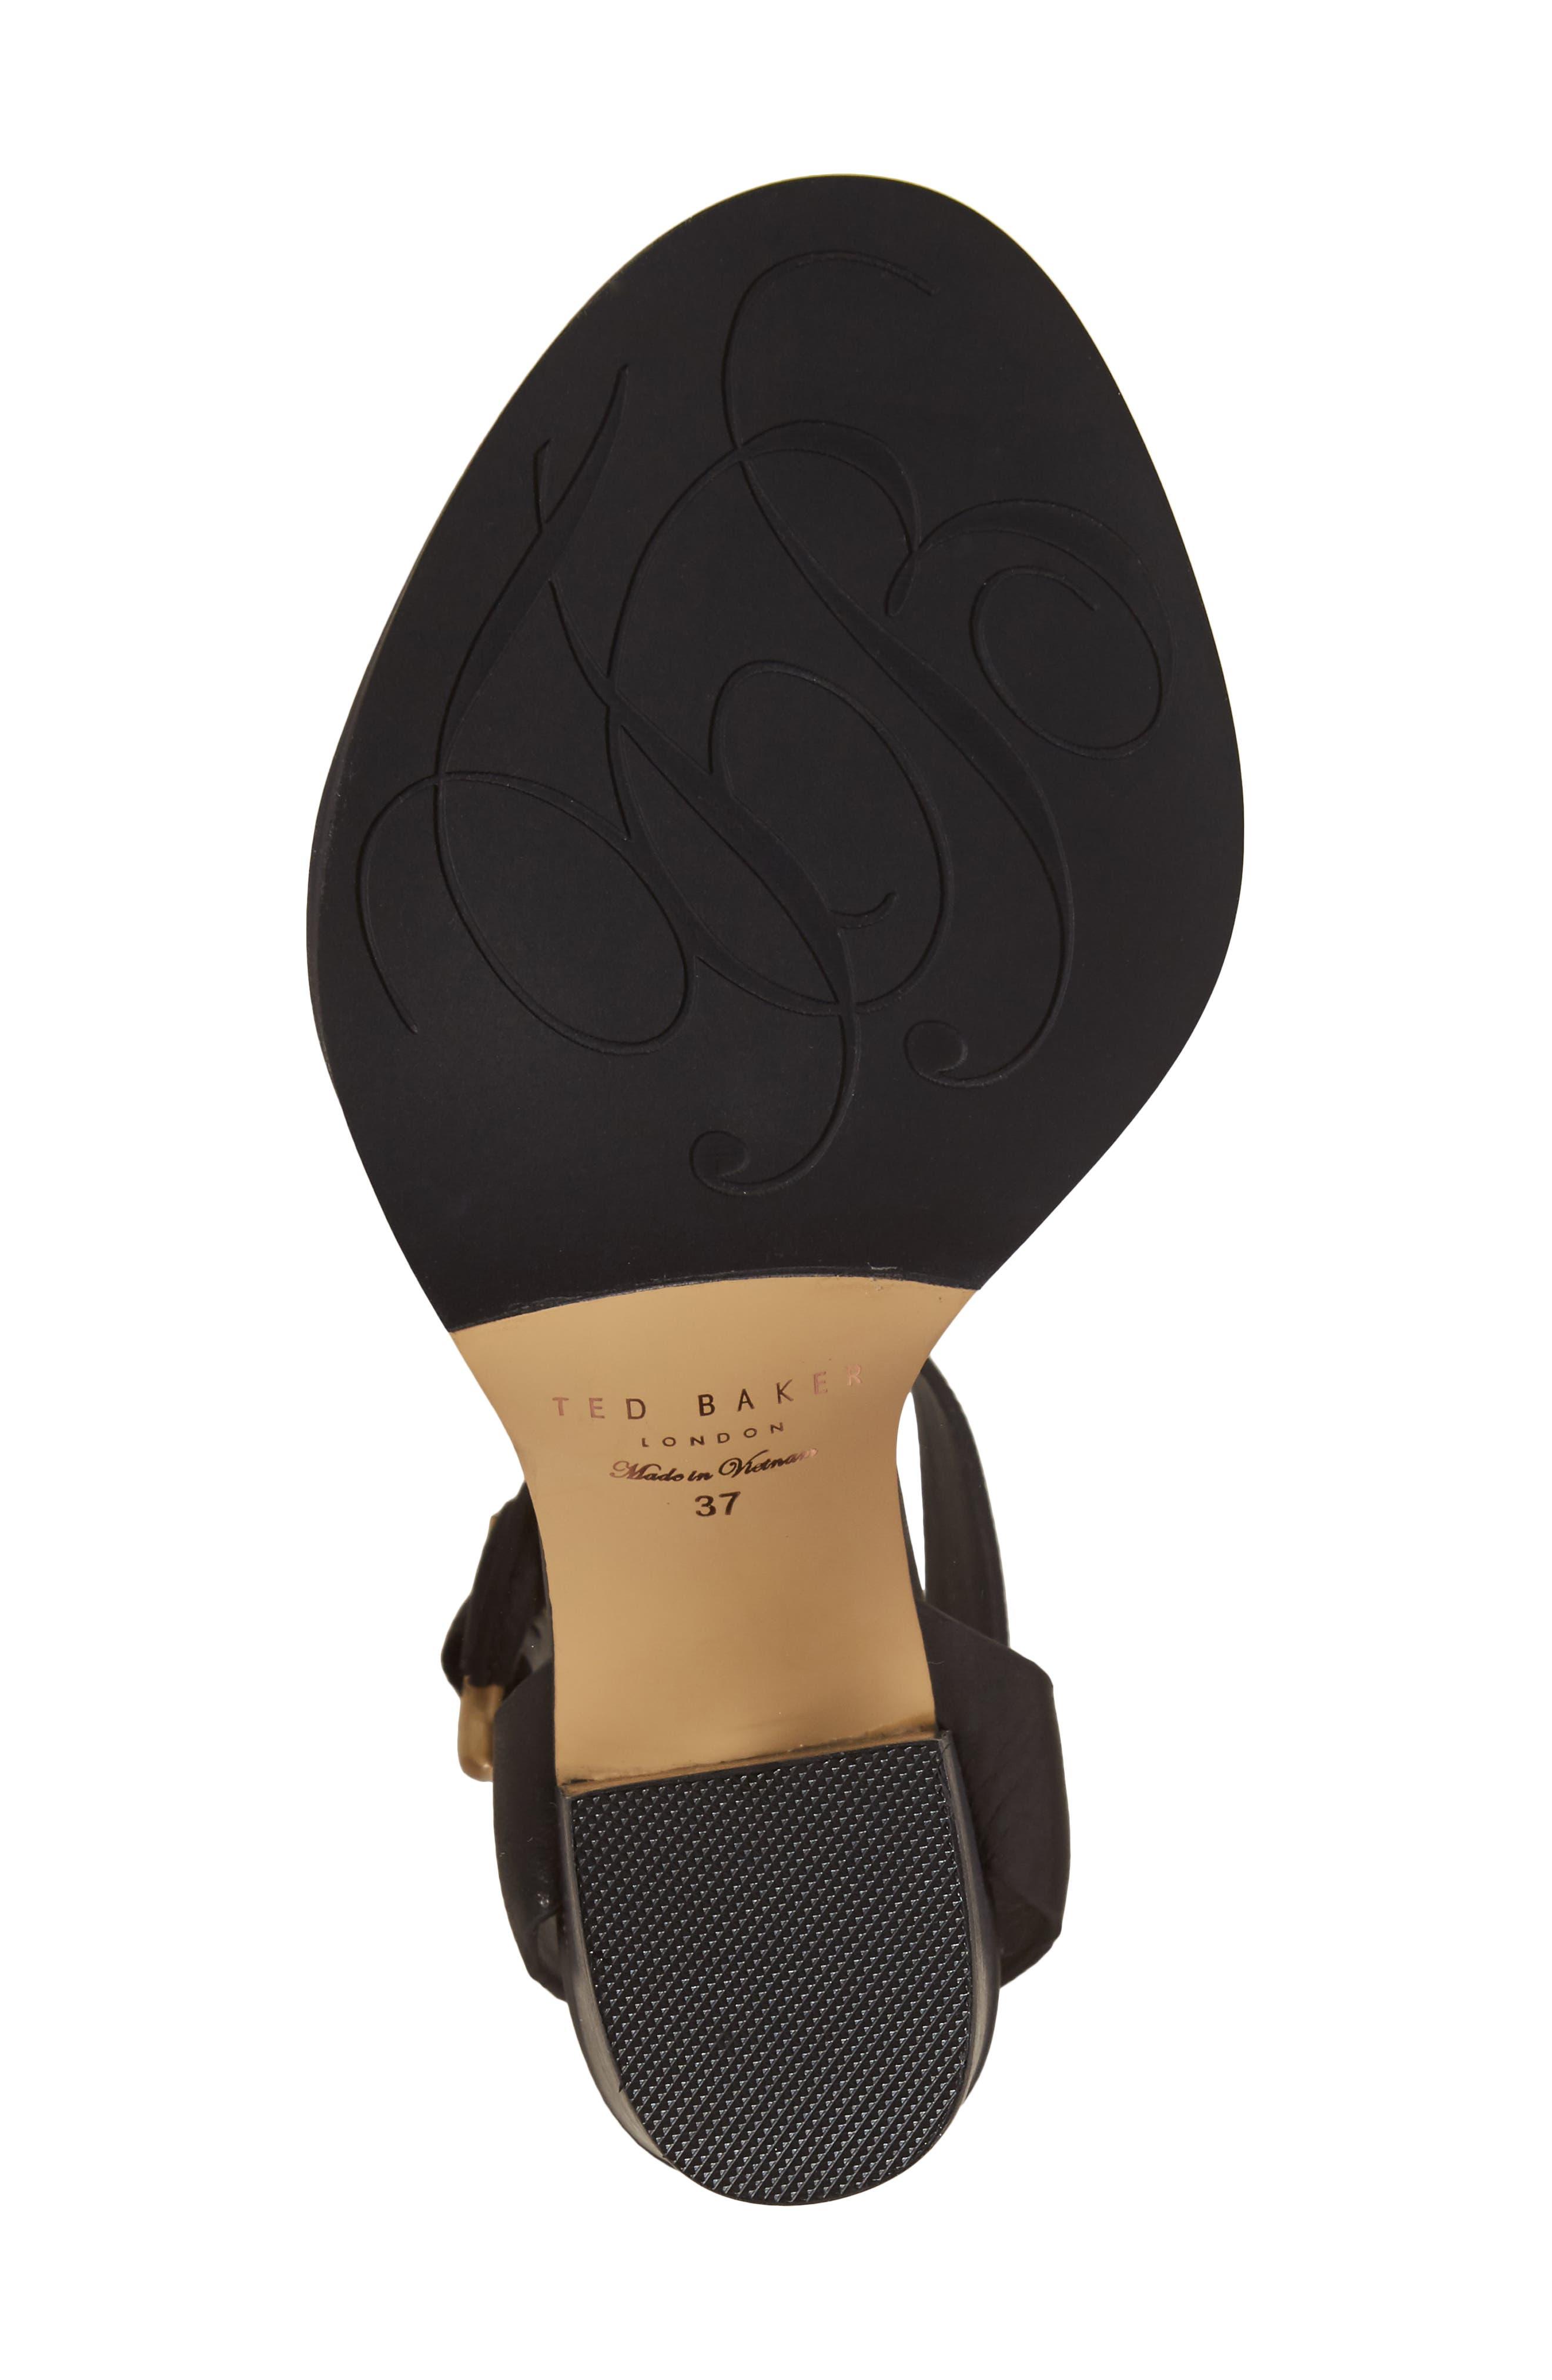 Betciy Ankle Strap Sandal,                             Alternate thumbnail 6, color,                             Black Leather